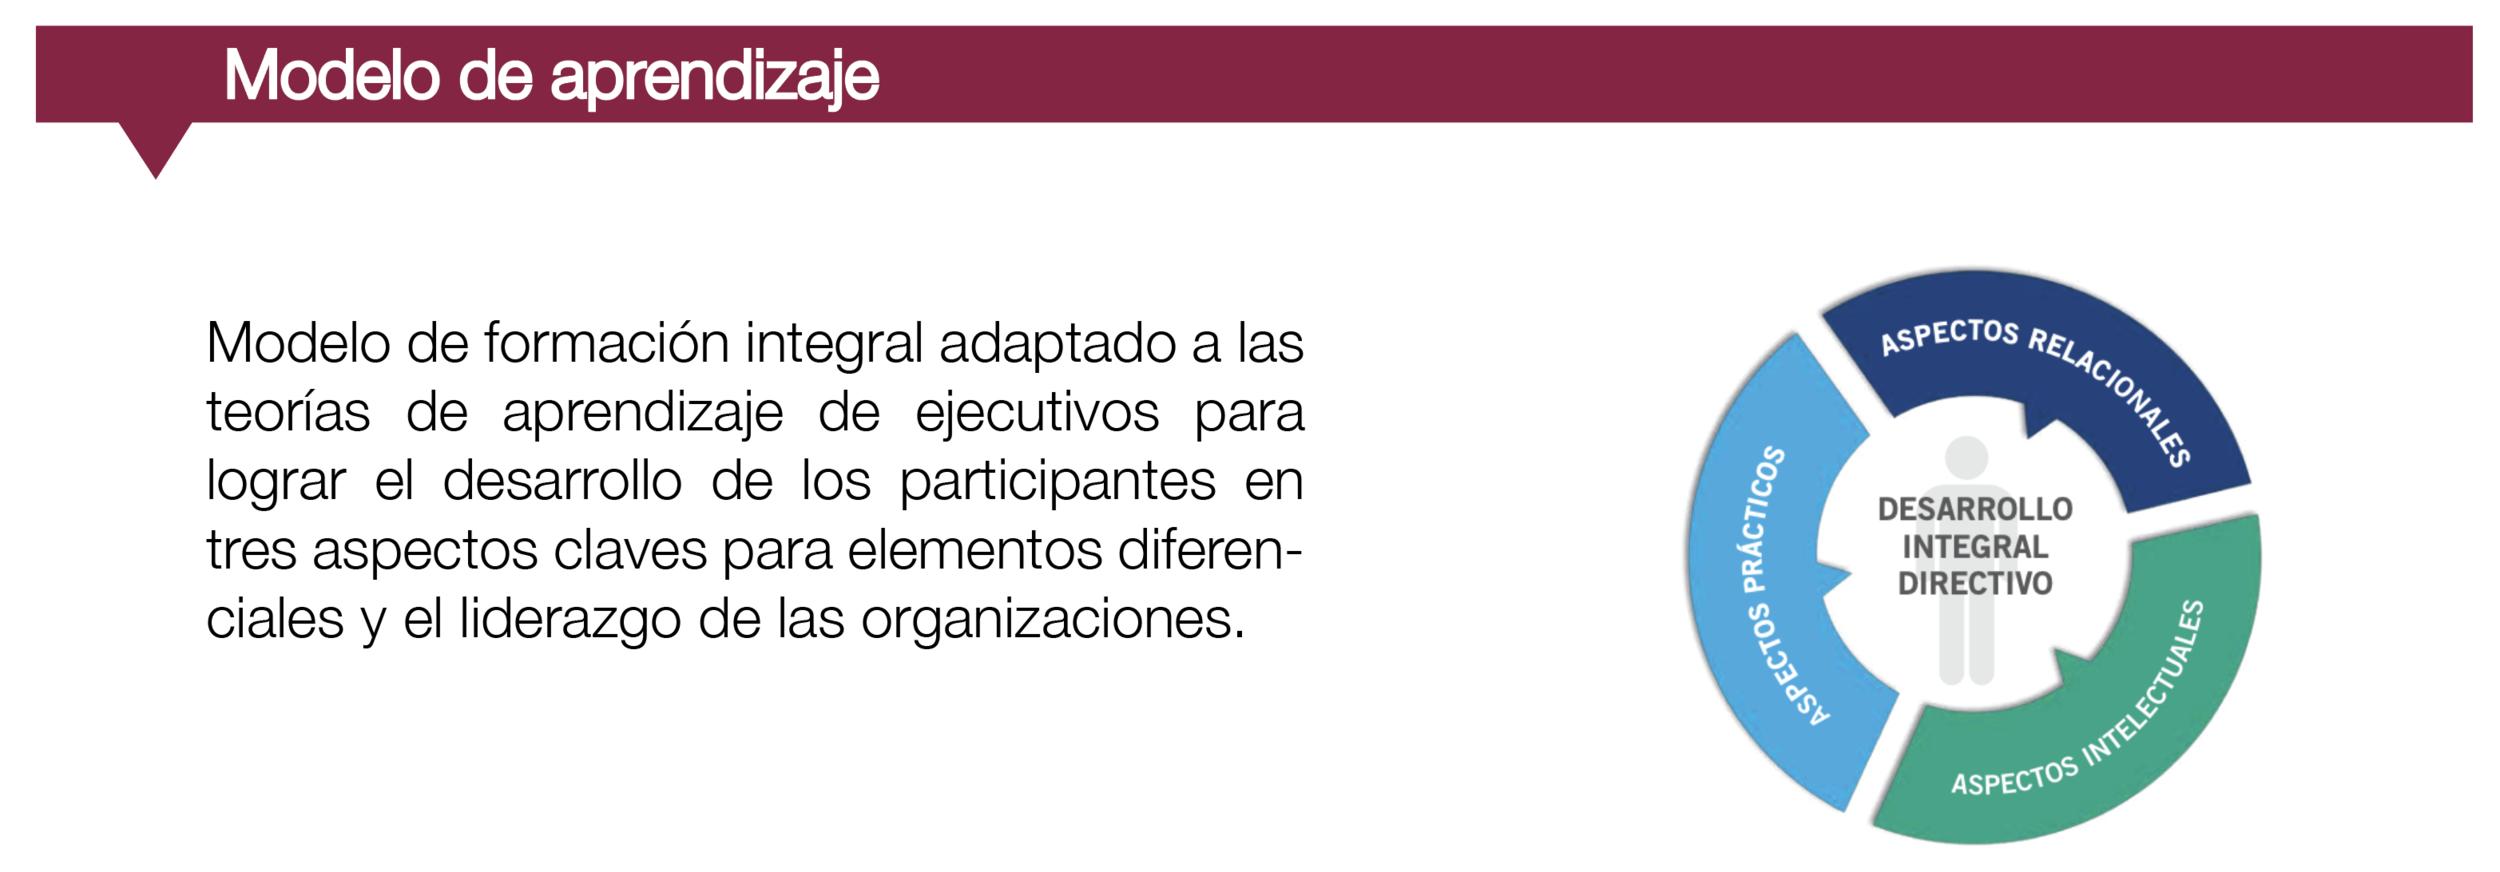 Modelo de aprendizaje.png